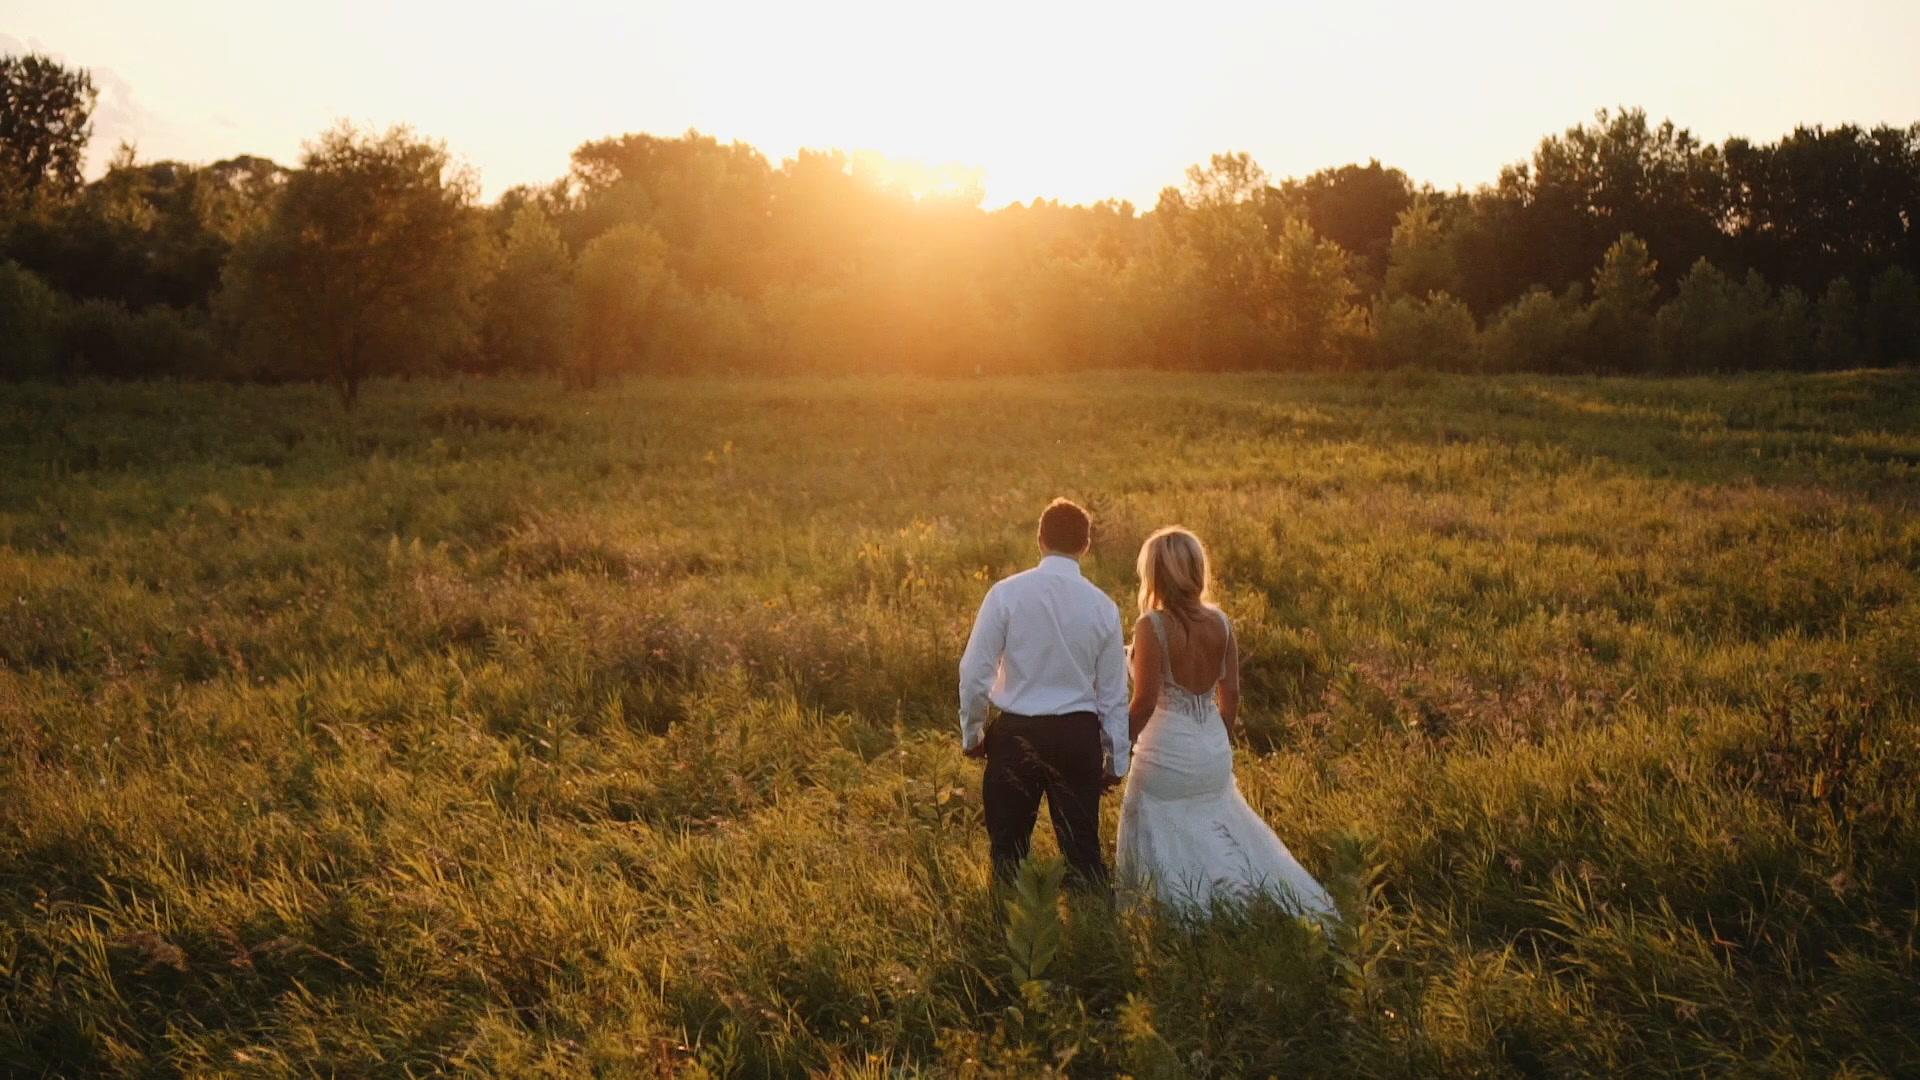 Teresa + Kyle | Minnesota, Minnesota | Family Property